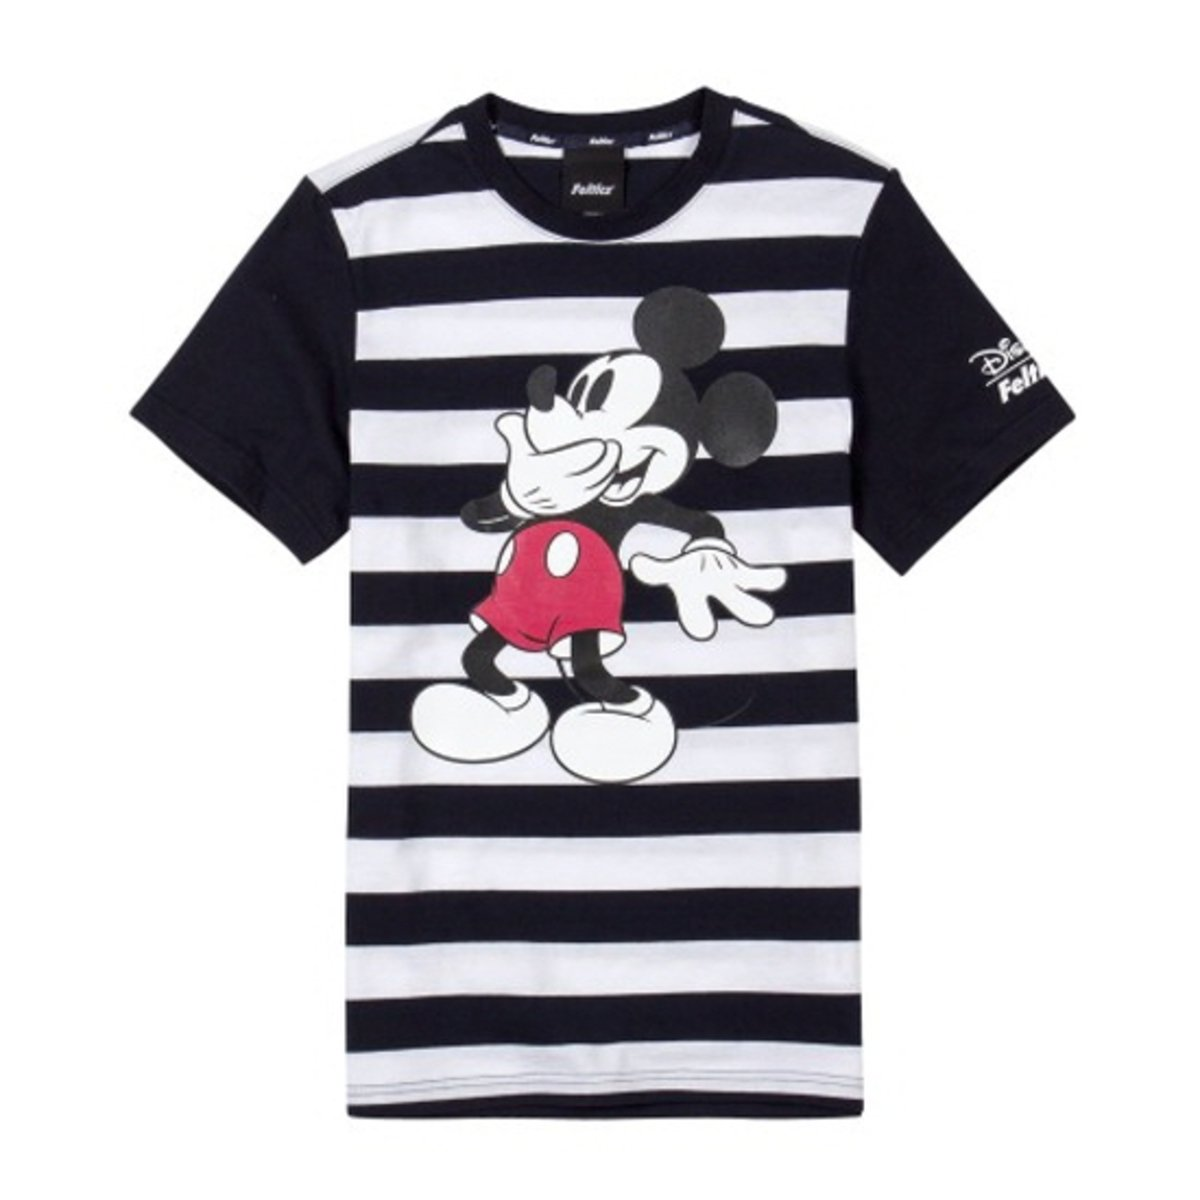 DISNEY MICKEY 公仔間色短袖T恤_FEOBMTS52